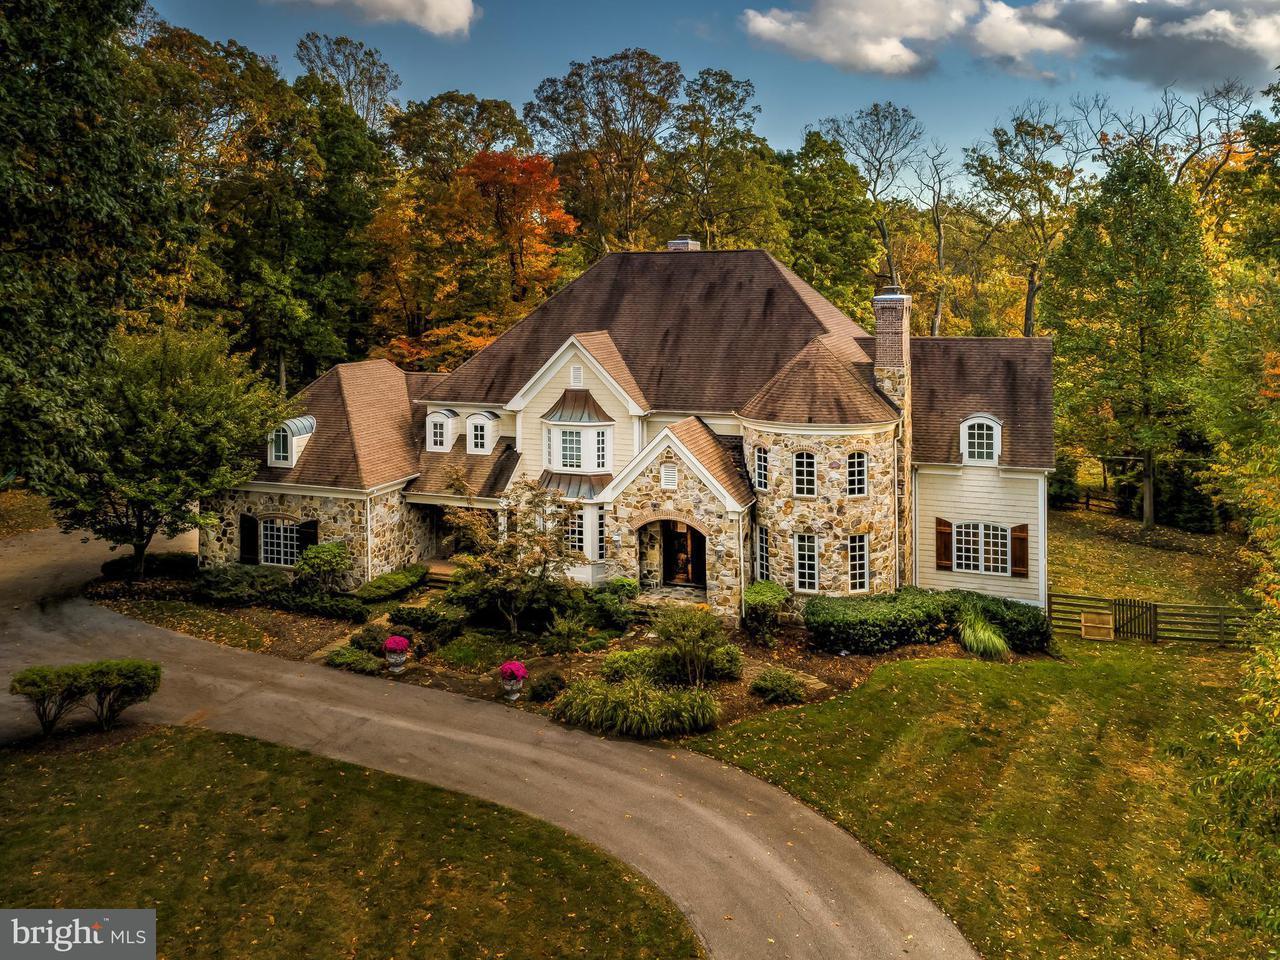 獨棟家庭住宅 為 出售 在 11 Spring Forest Court 11 Spring Forest Court Owings Mills, 馬里蘭州 21117 美國